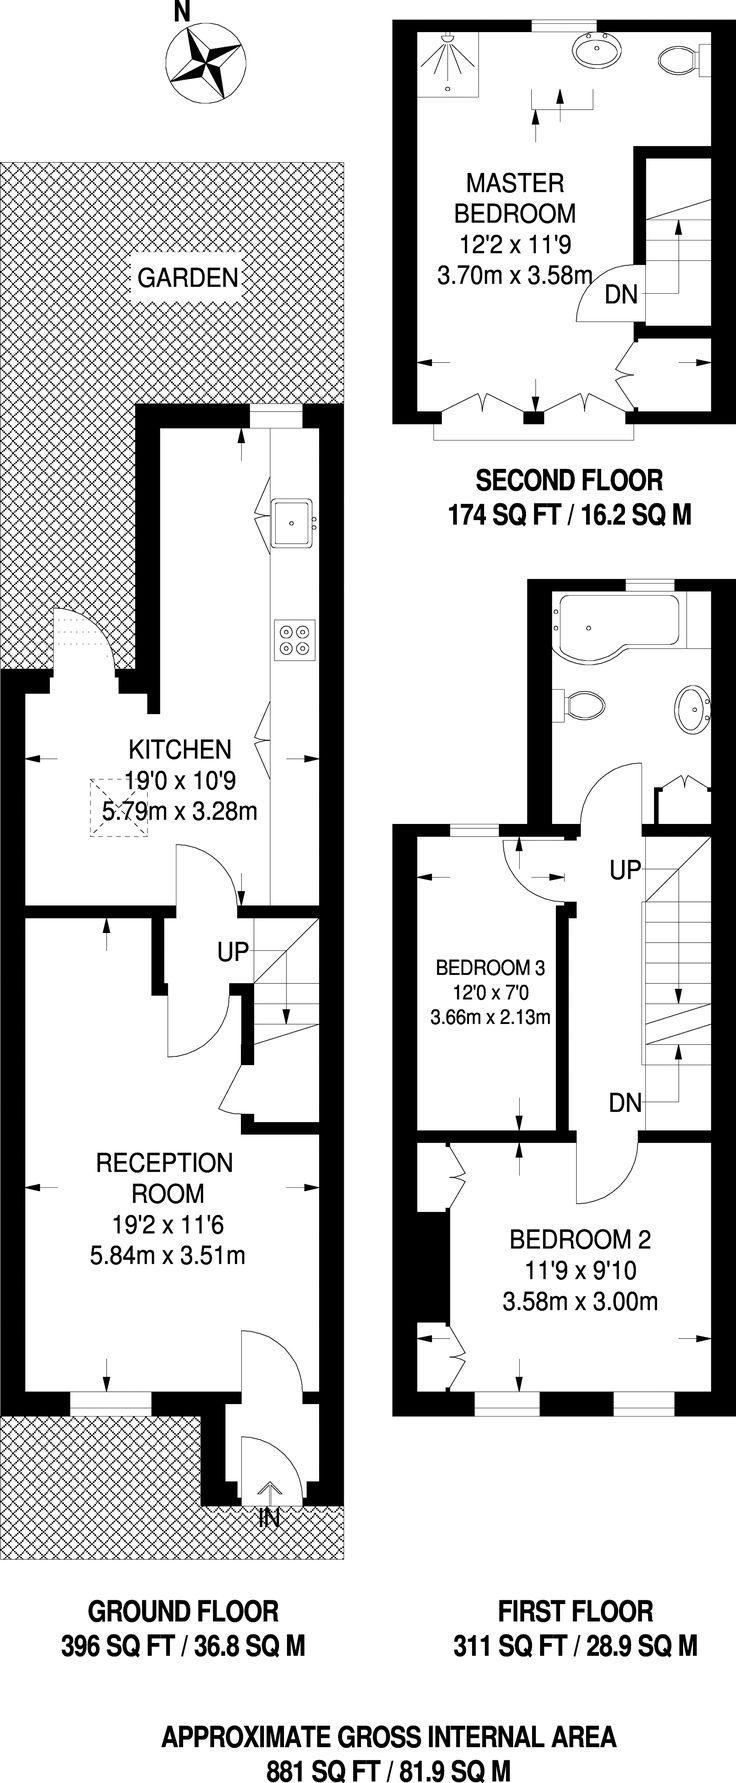 Master Bedroom Extension Plans 696 best loft conversions & extensions images on pinterest | loft